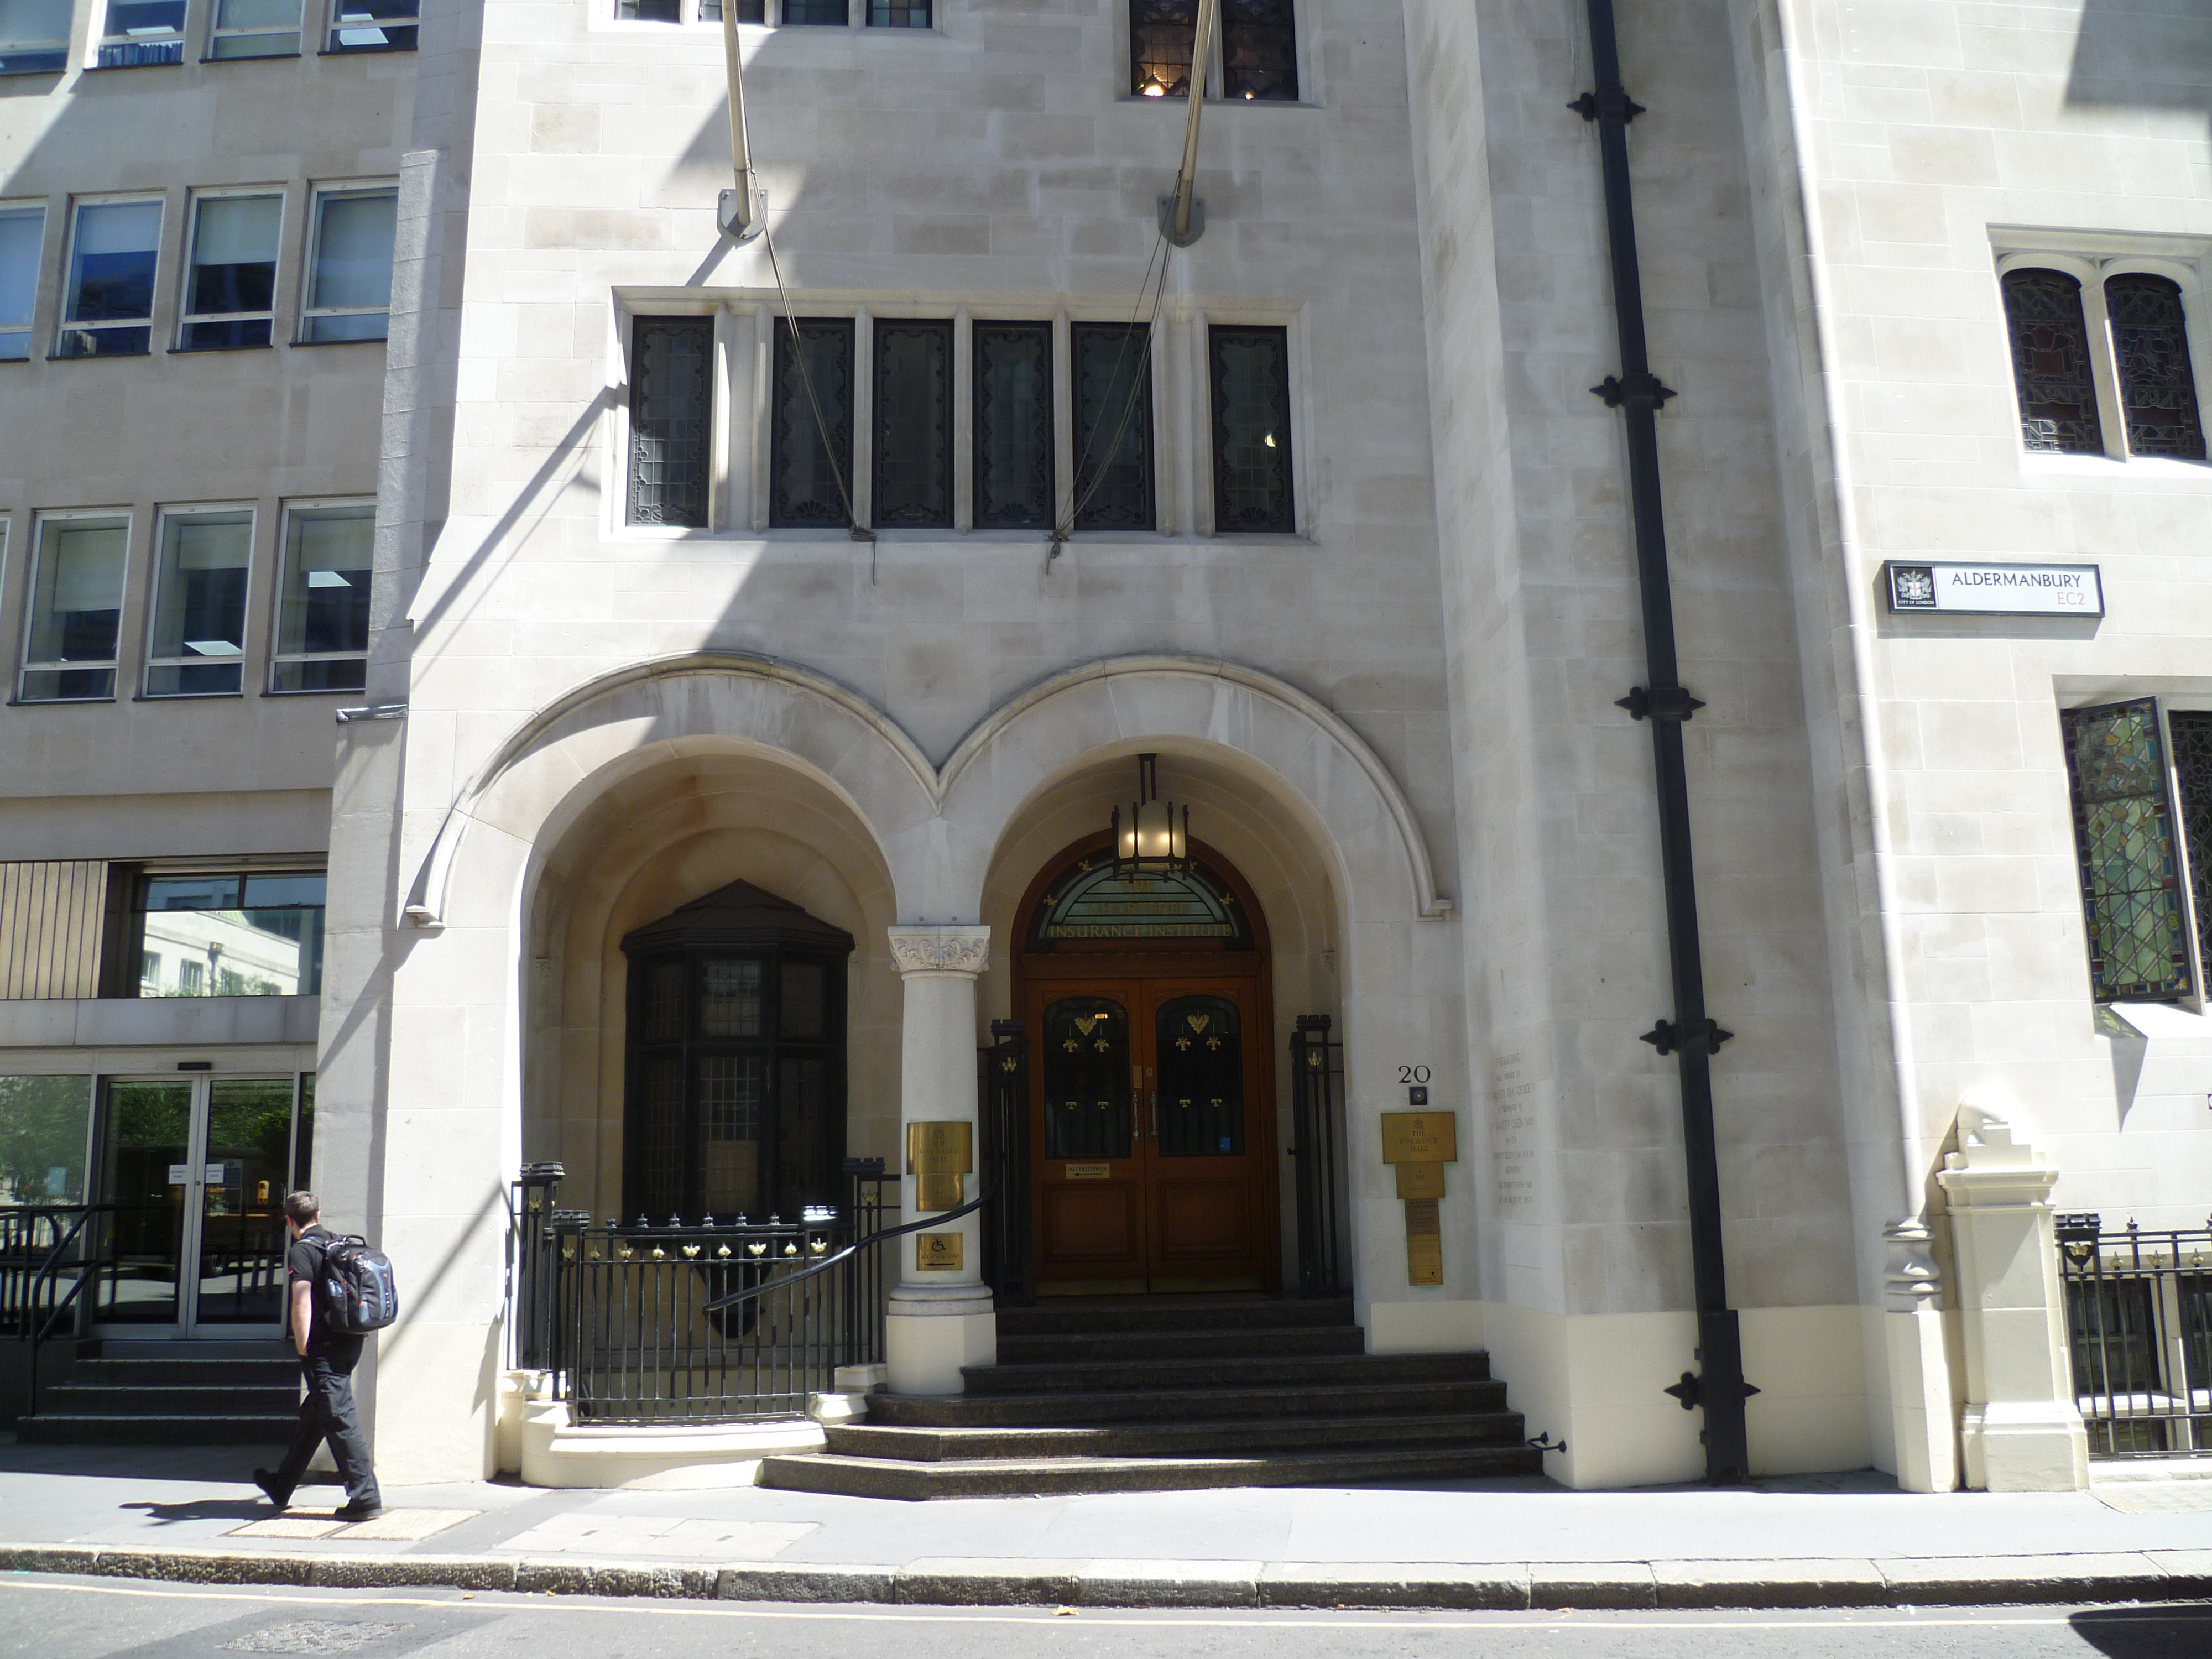 FileChartered Insurance Institute Aldermanbury London 01JPG